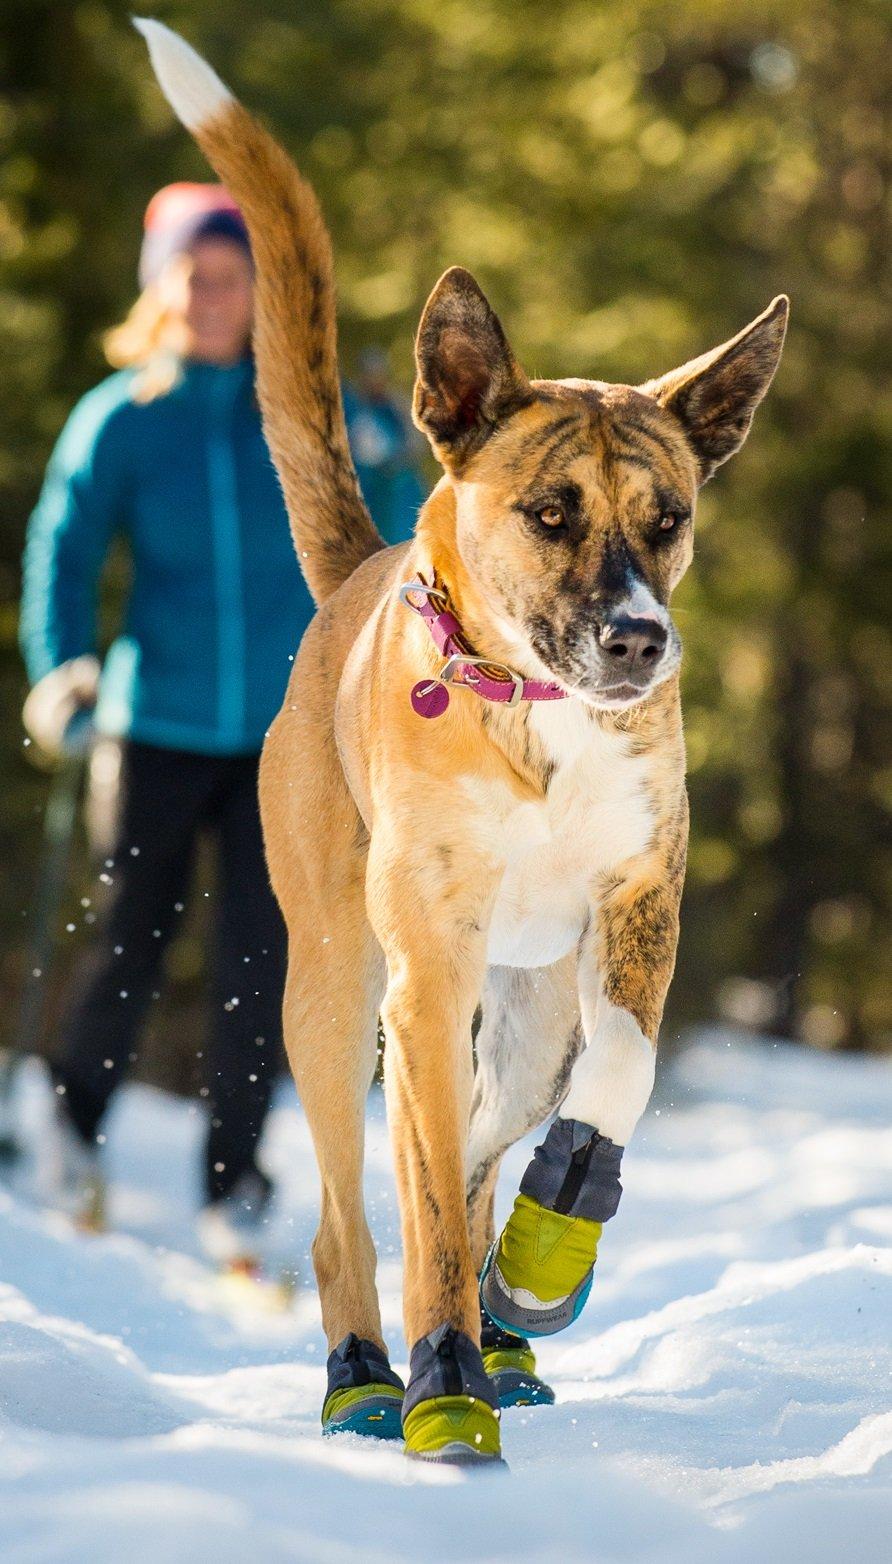 RUFFWEAR Polar TREX Dog Boots Set of 4 ♦ Winter Traction and Insulation (2.25 Inch) by RUFFWEAR